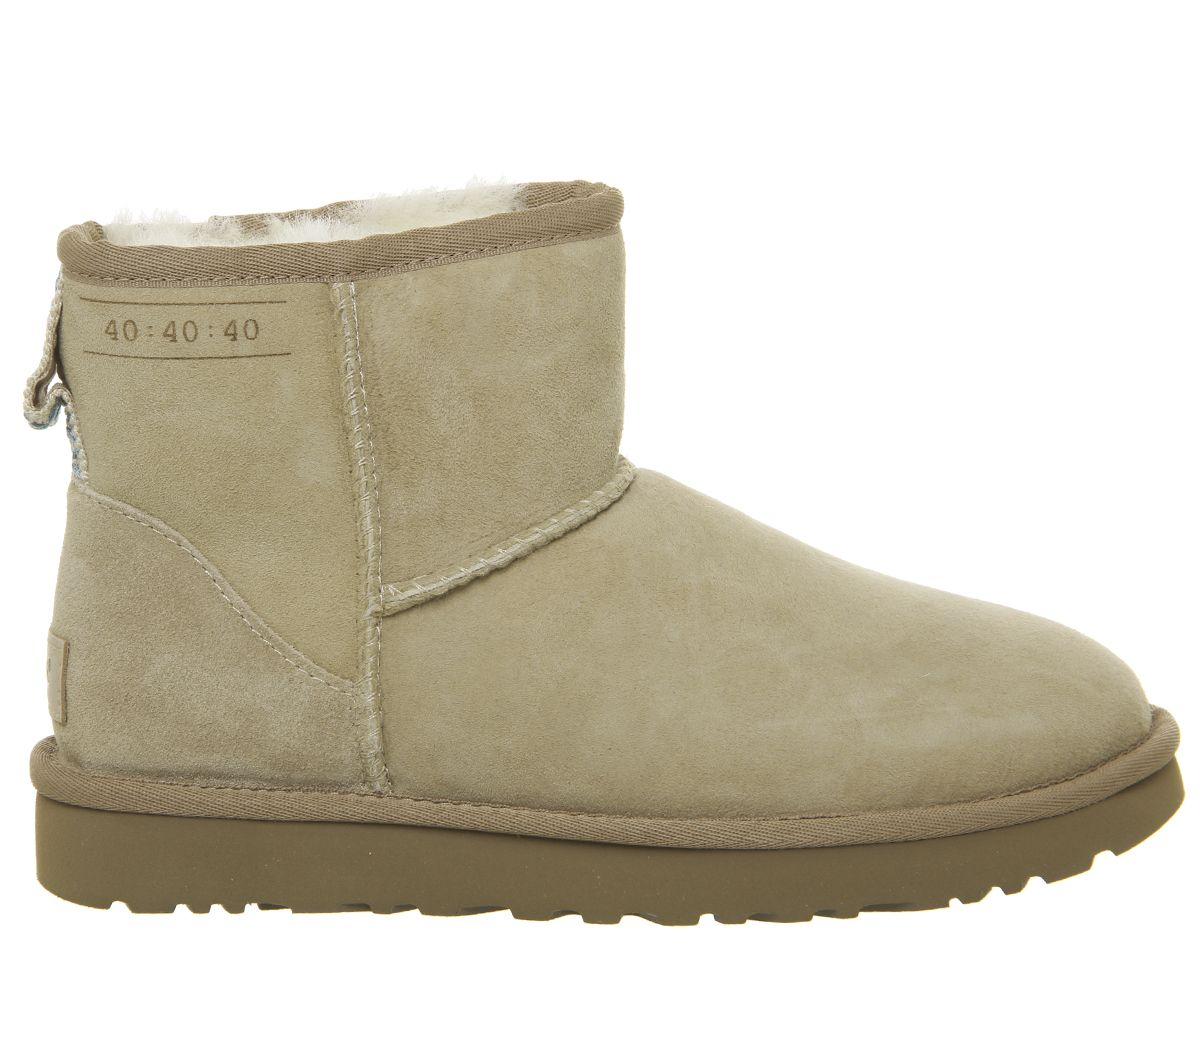 358325b7b75 UGG Classic Mini 40 40 40 Boots Sand - Ankle Boots